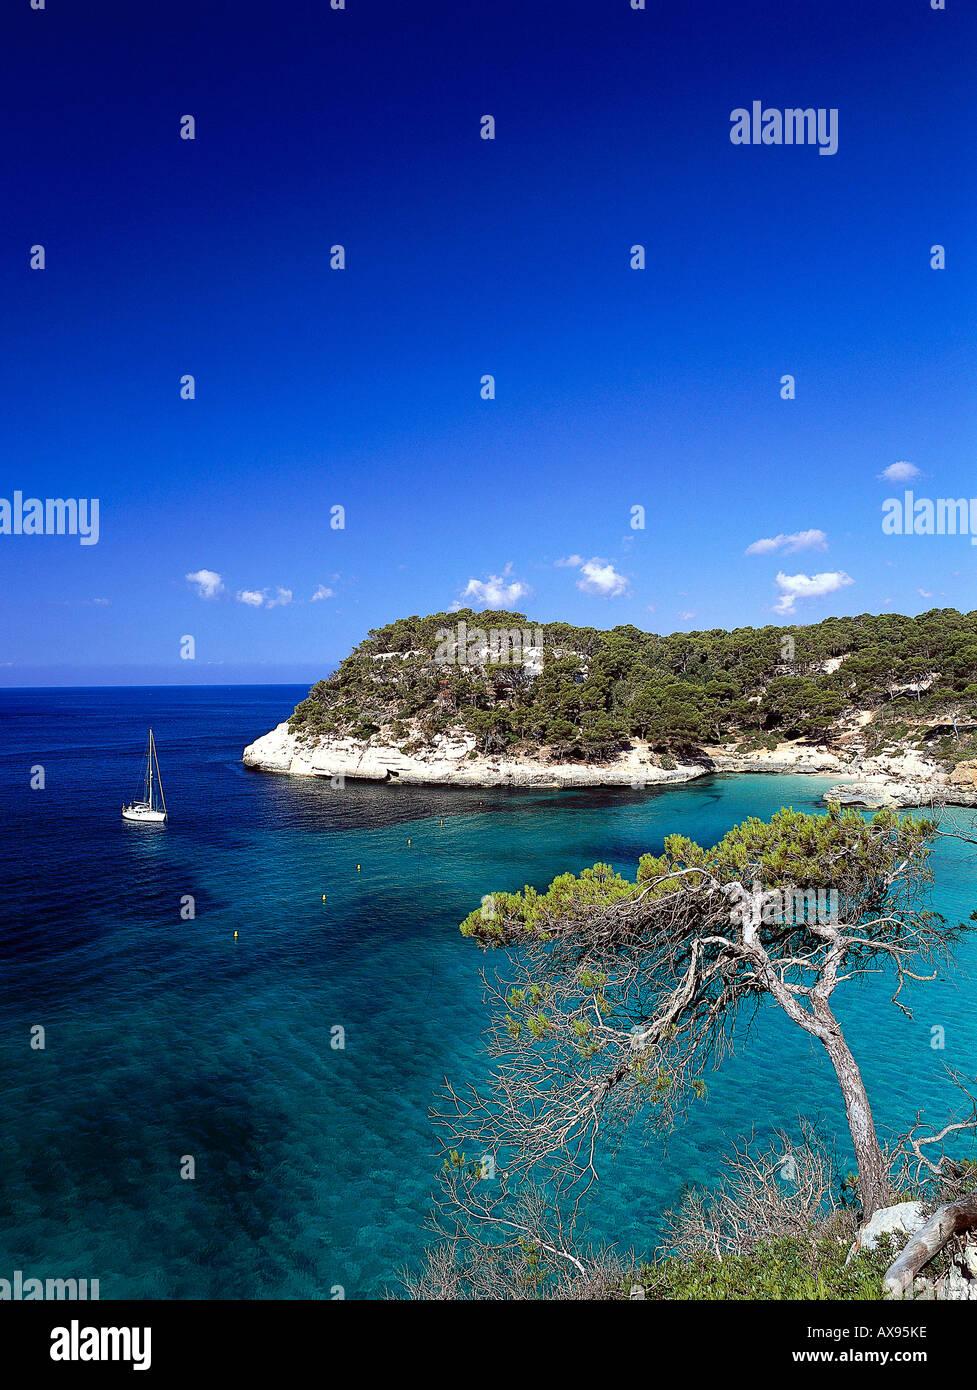 Coastal landscape Cala Mitjana near Cala Galdana, Minorca, Spain - Stock Image